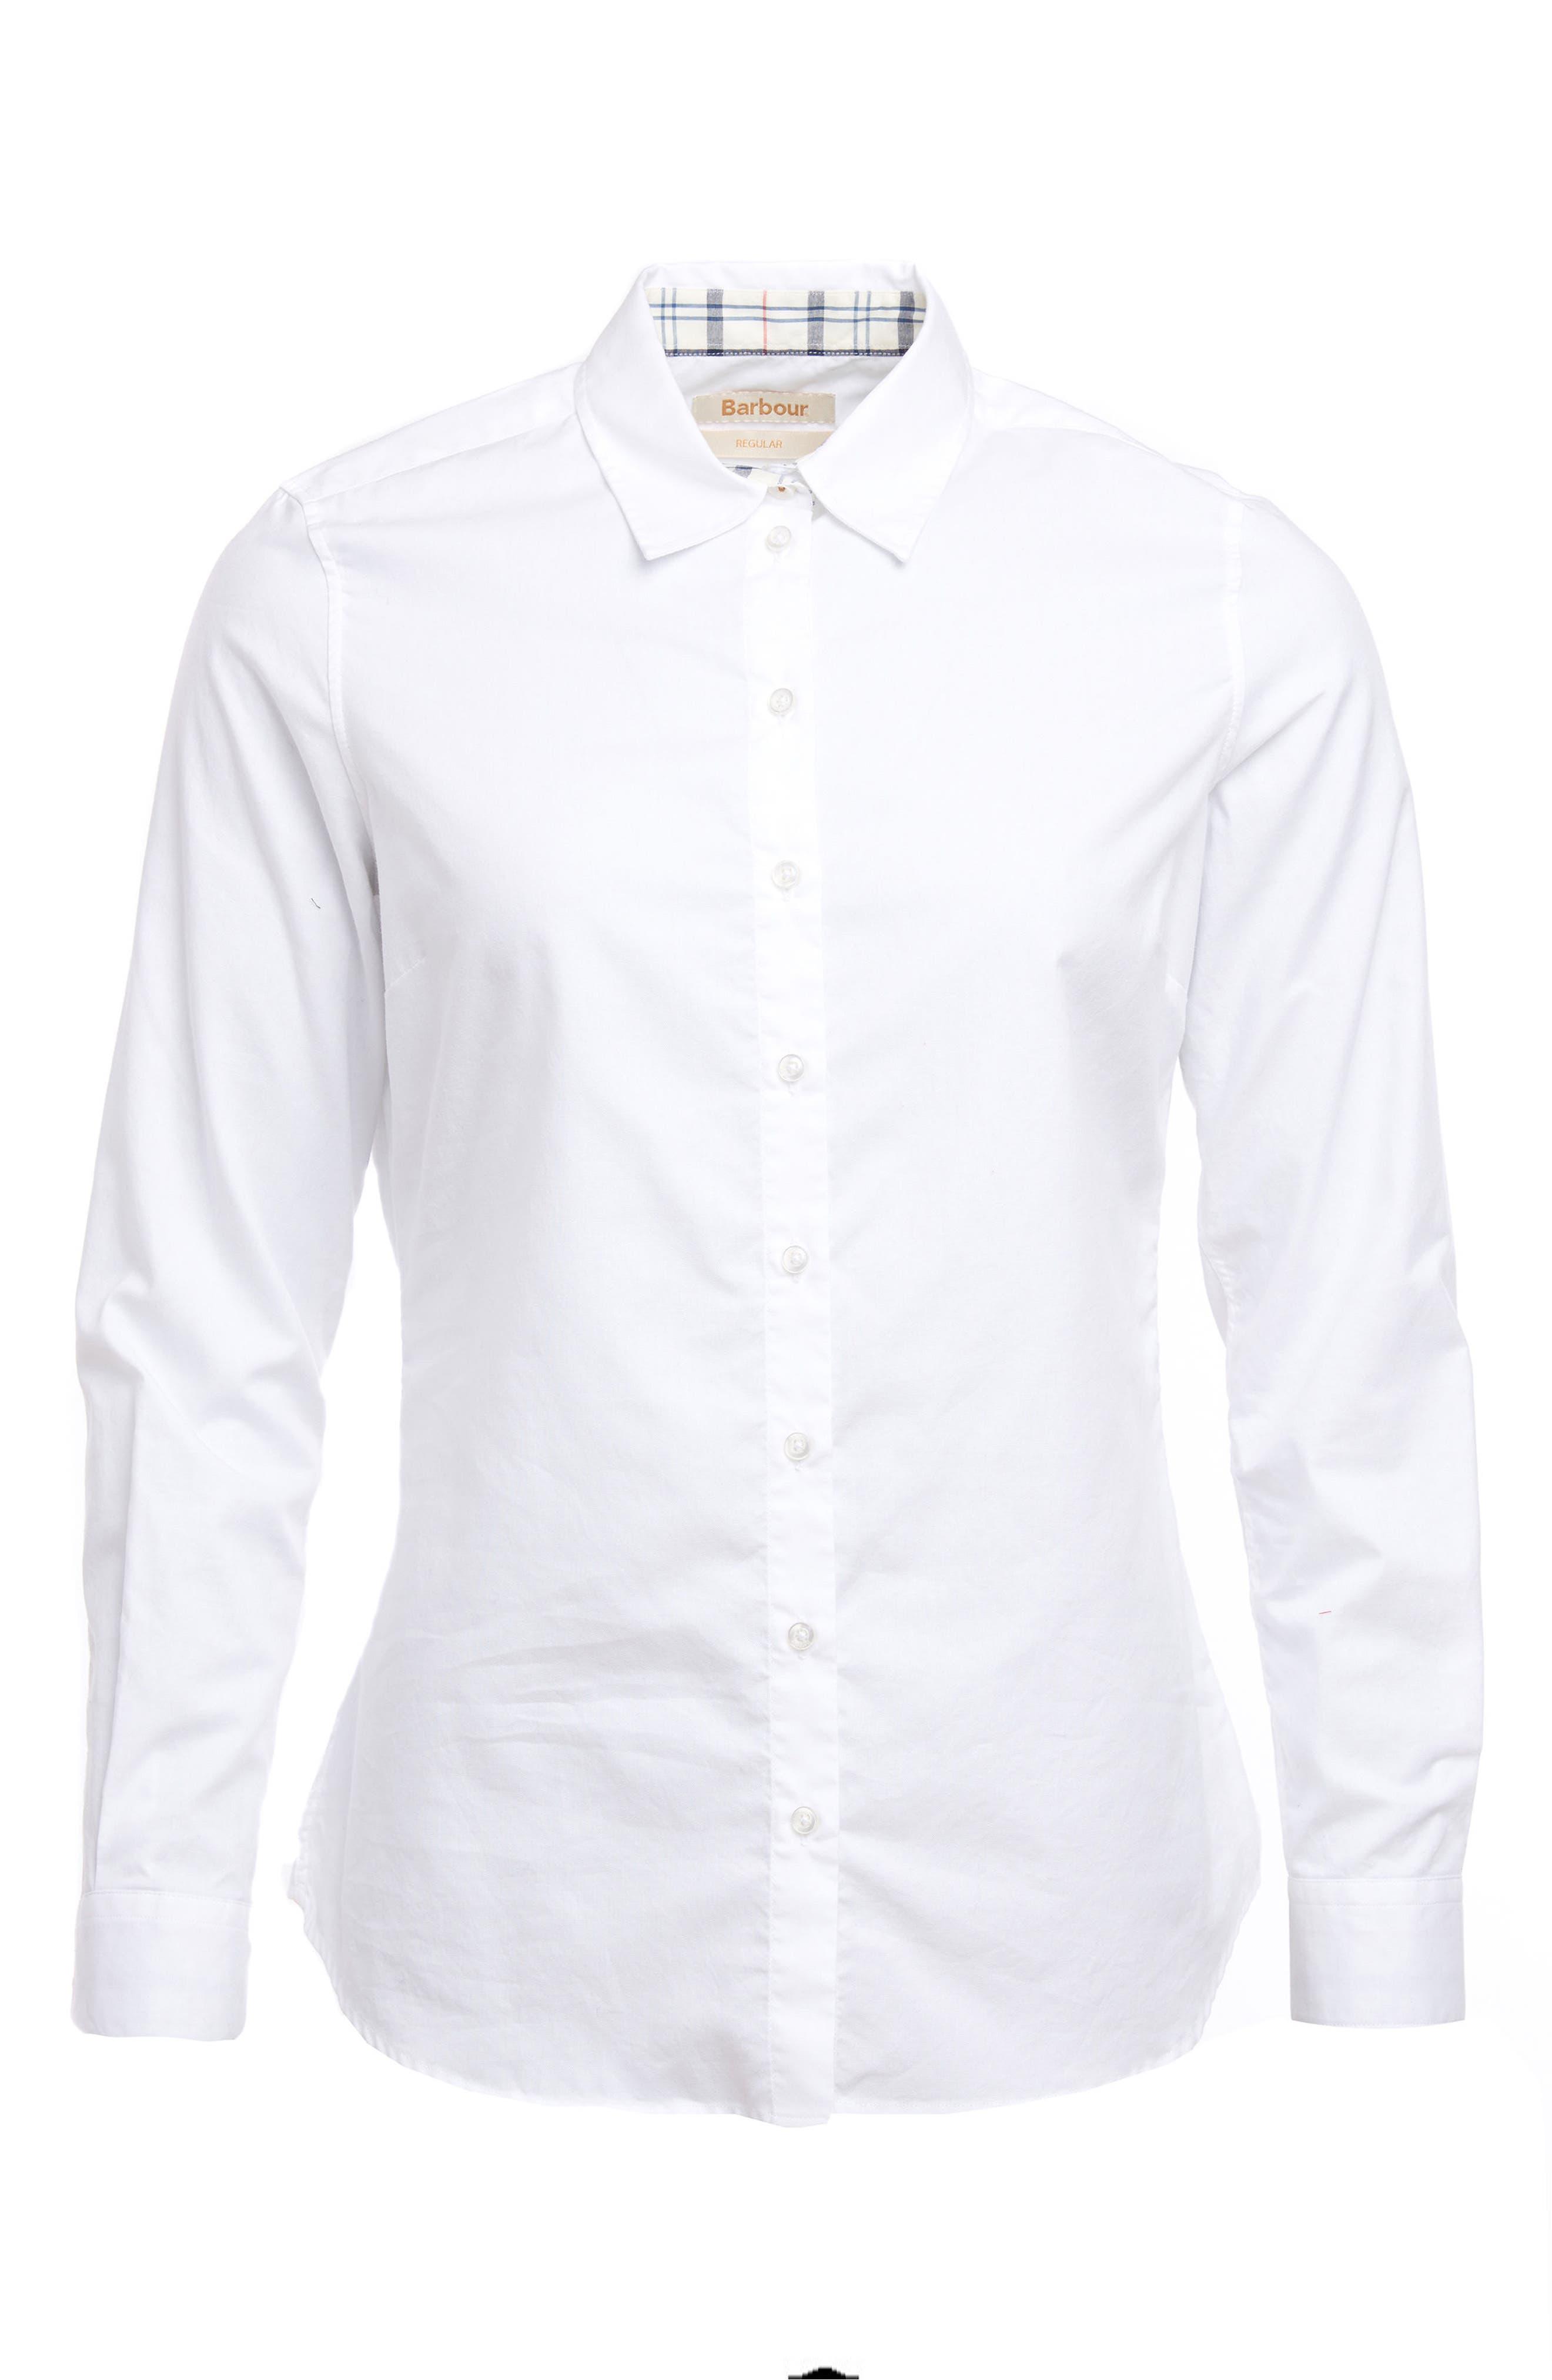 Barbour Deerness Shirt